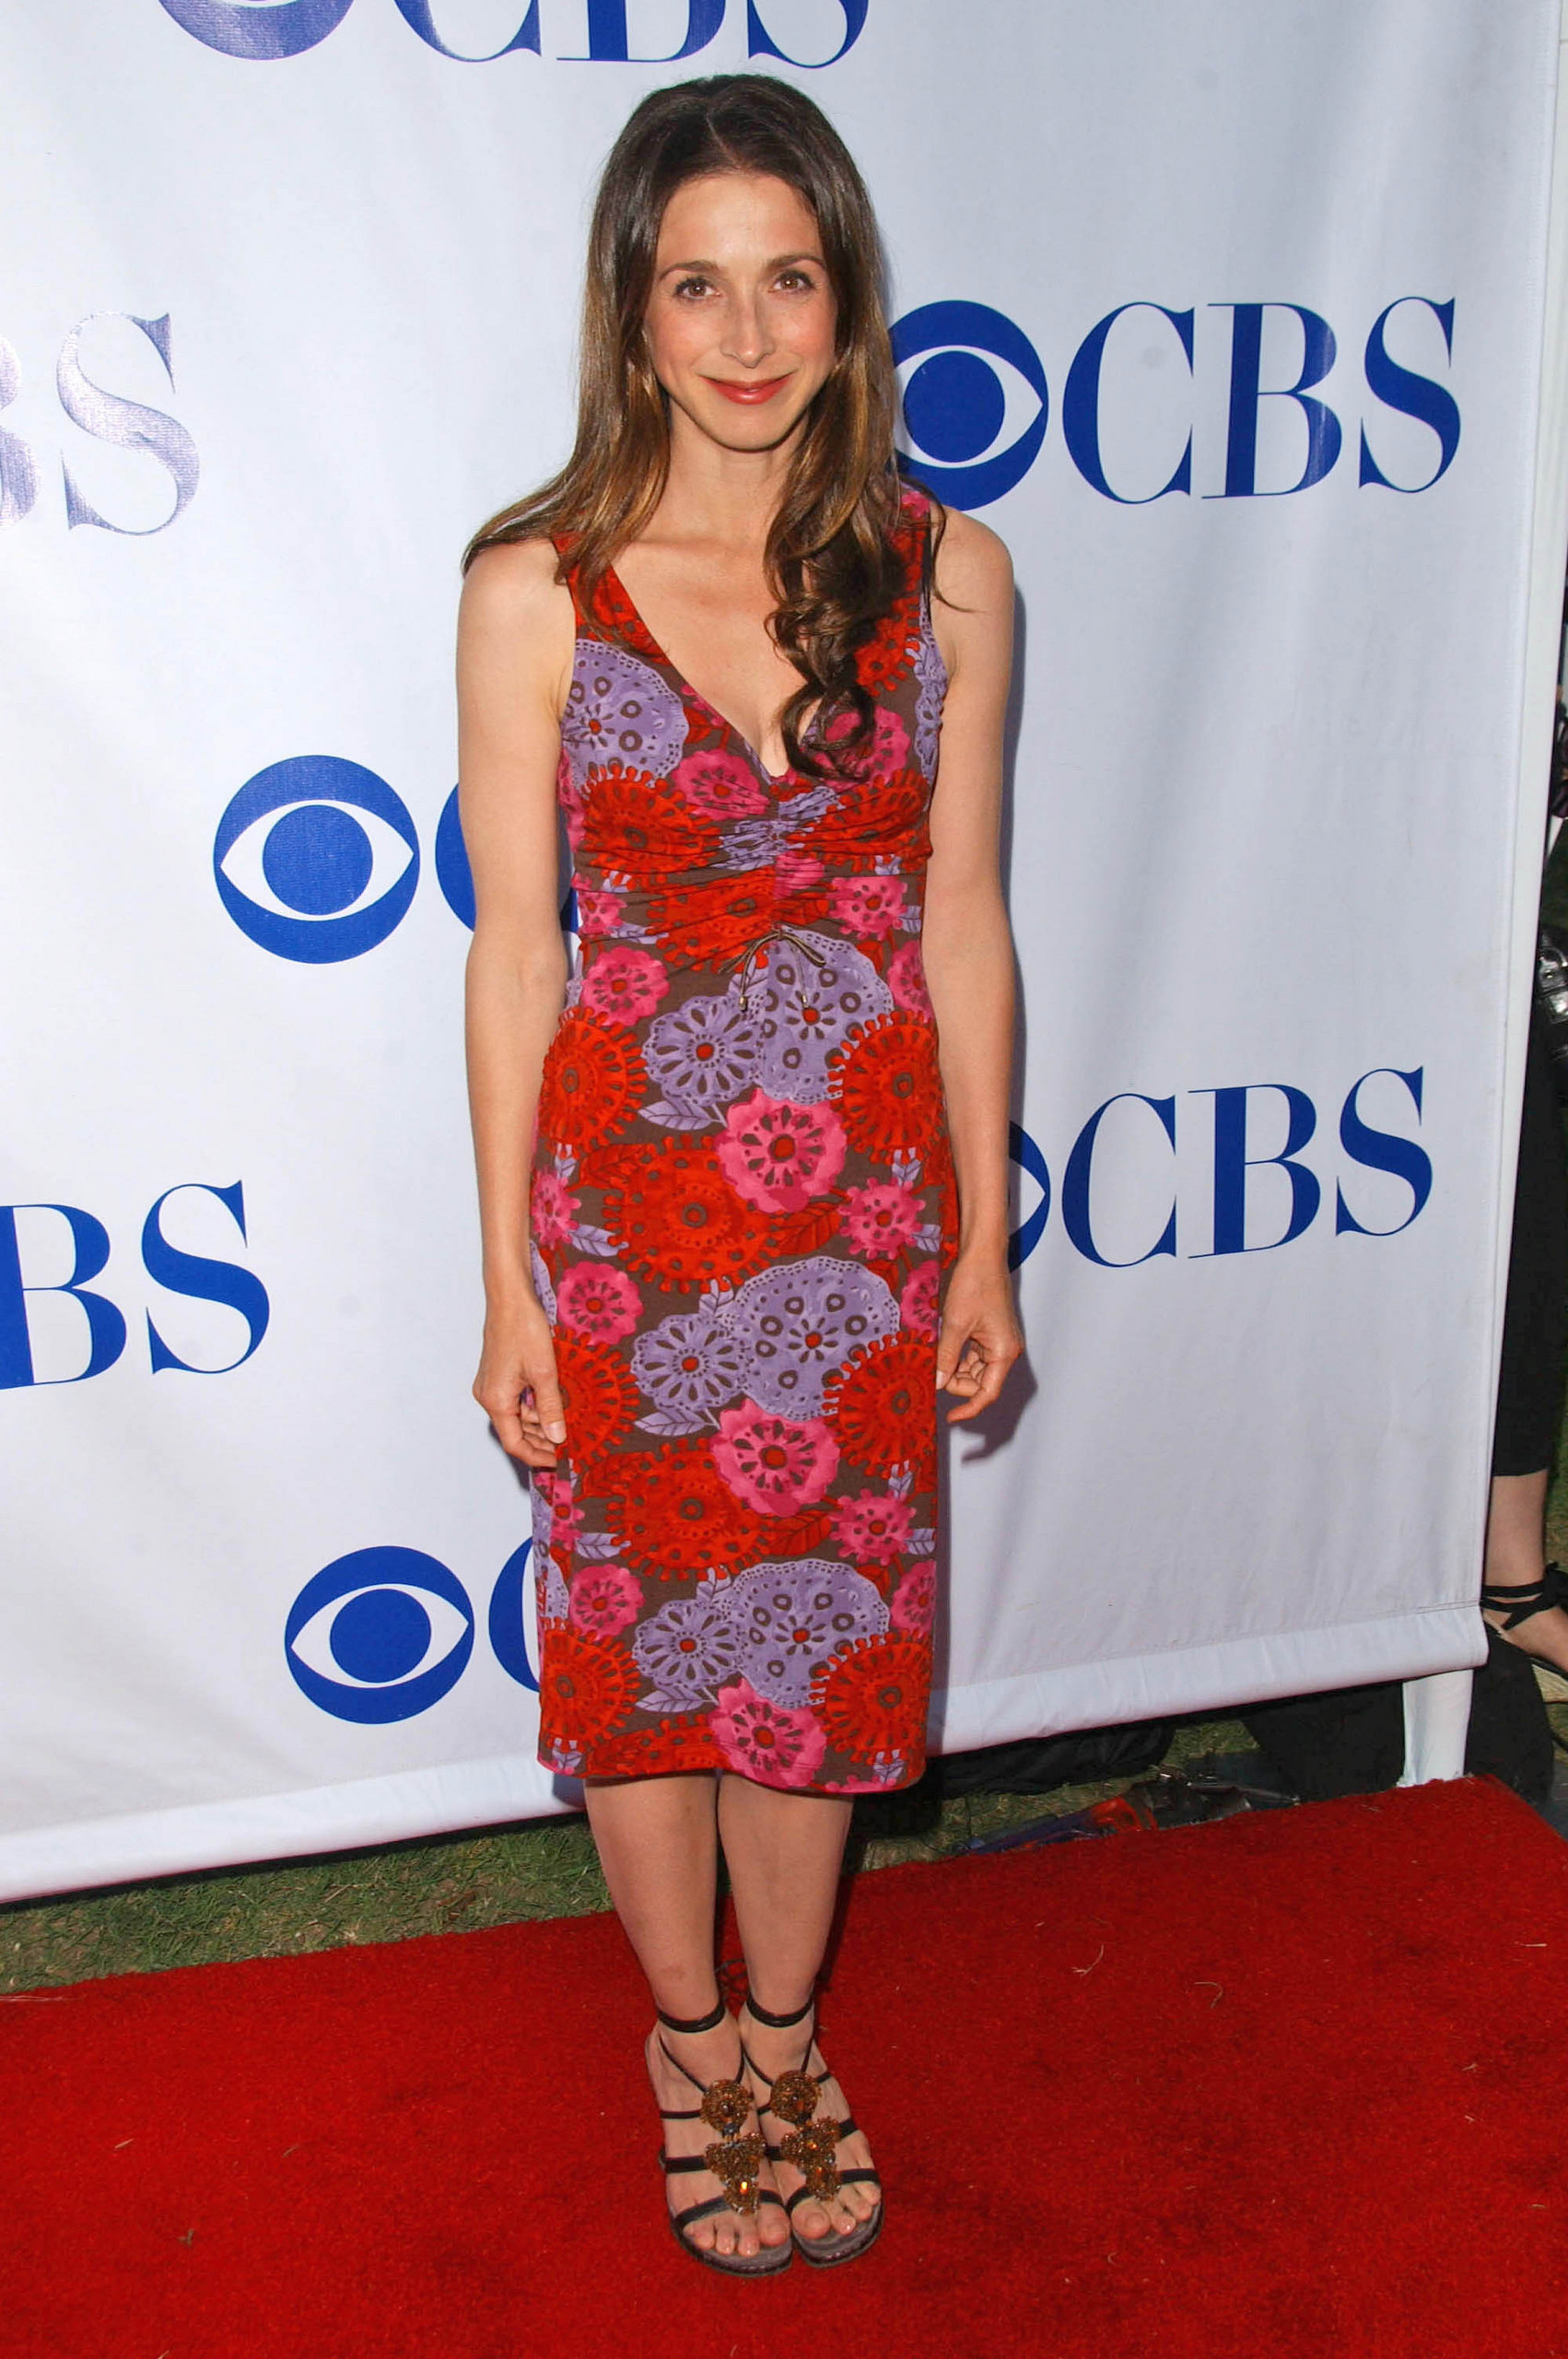 CBS TCA Summer Press Tour Party